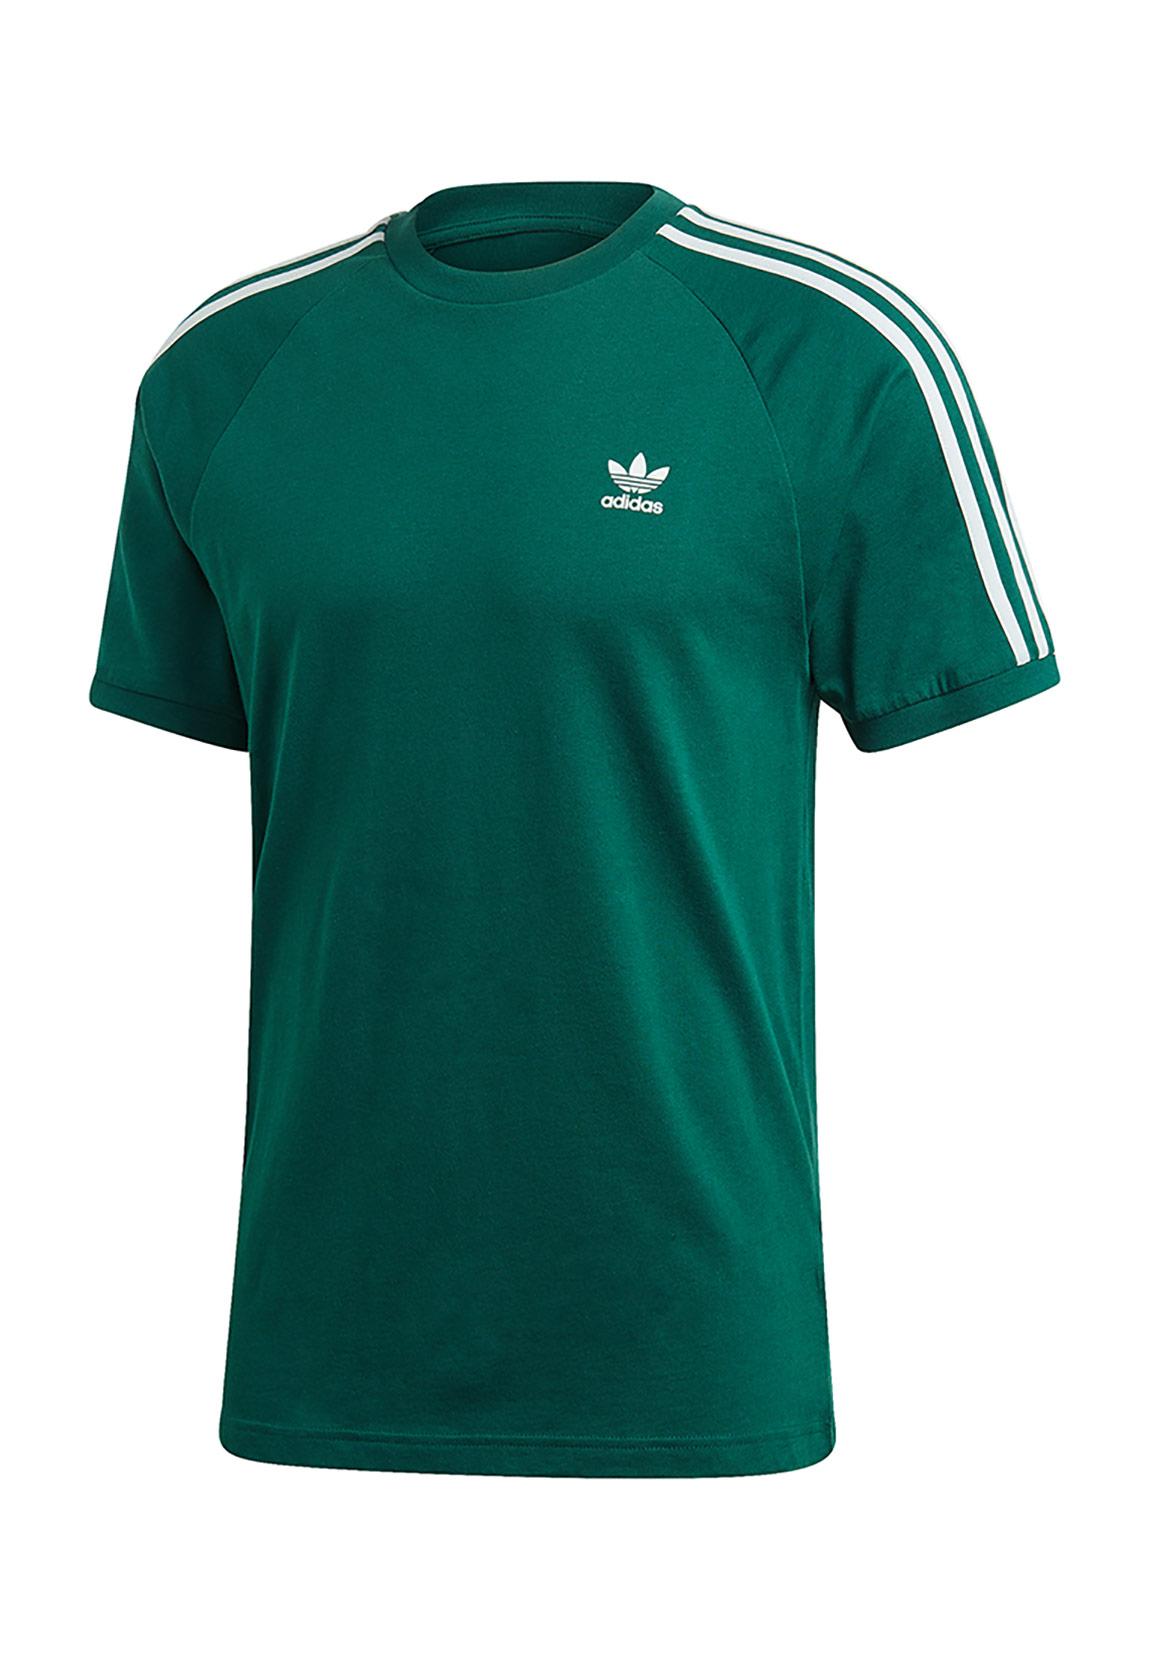 Details zu Adidas Originals T Shirt Herren BLC 3 S TEE ED5956 Khaki